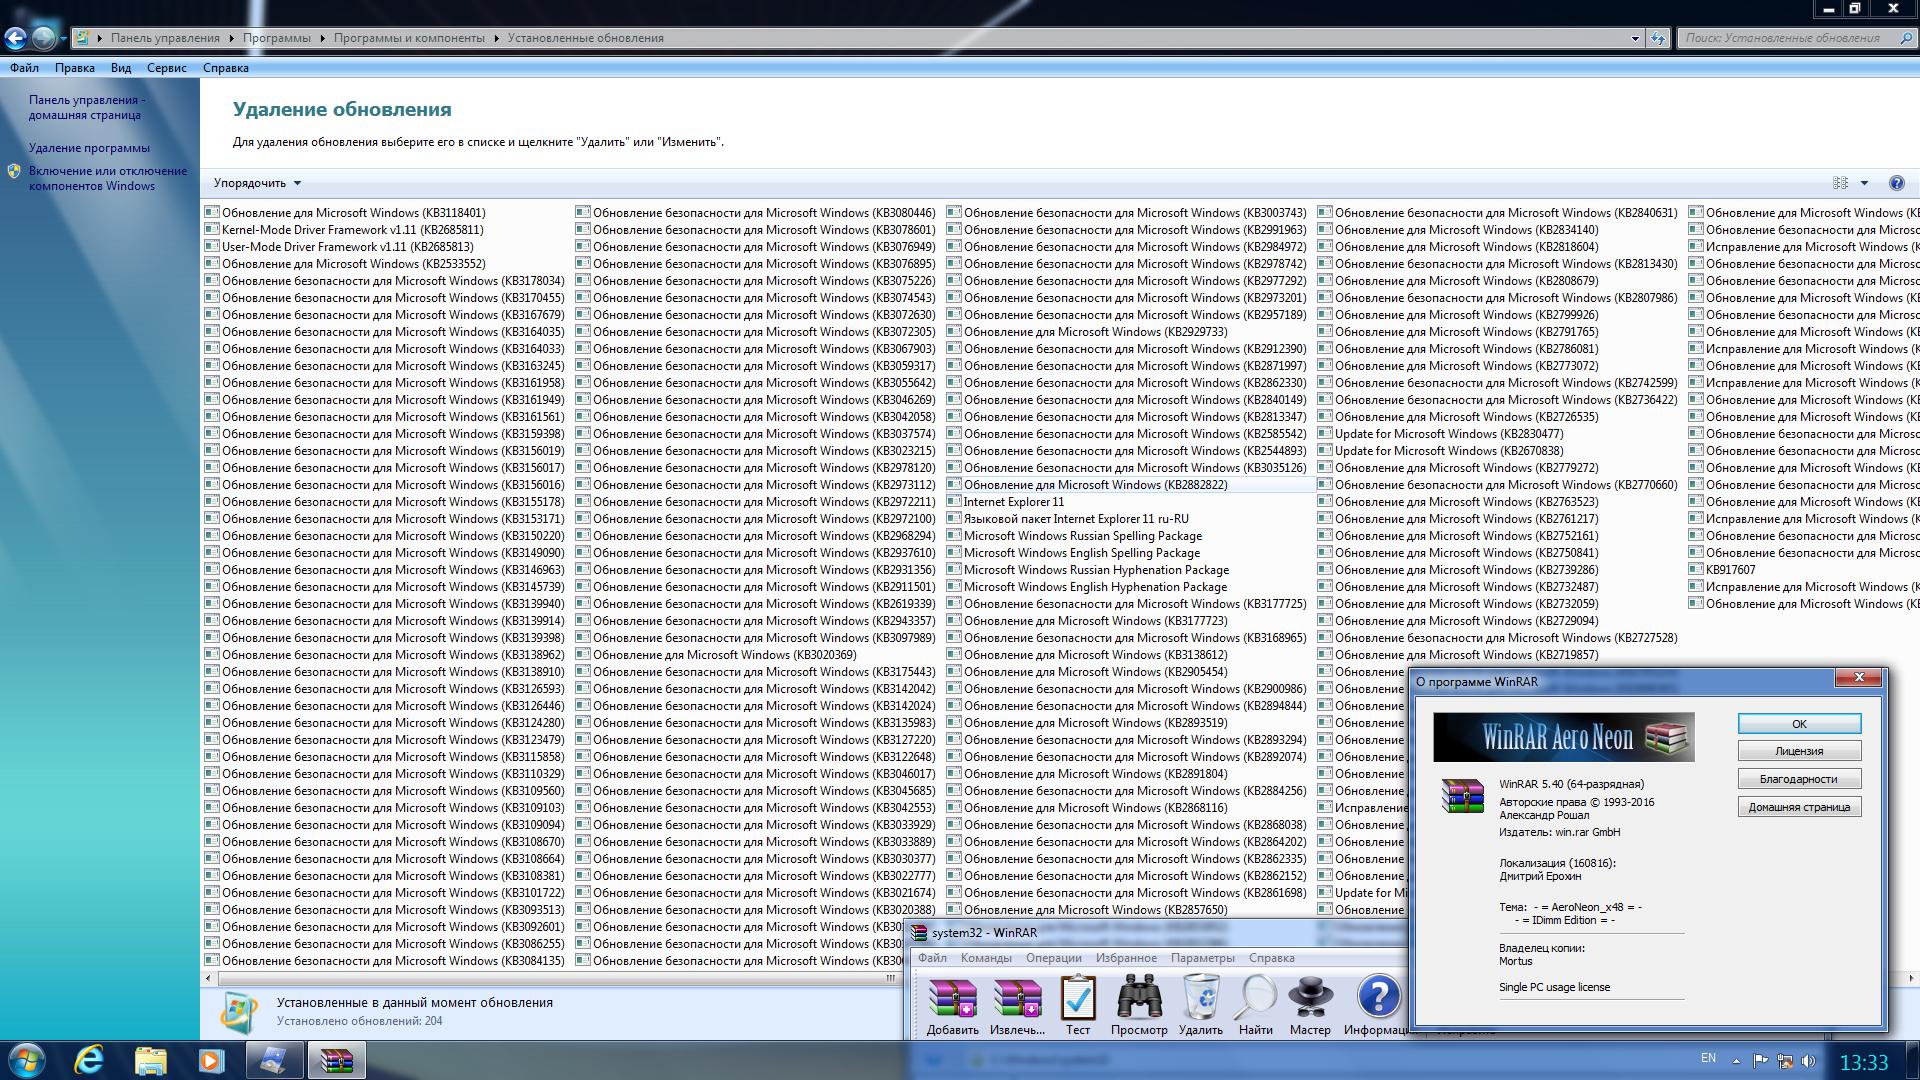 Windows 7 Home Premium ISO free download | PCRIVER